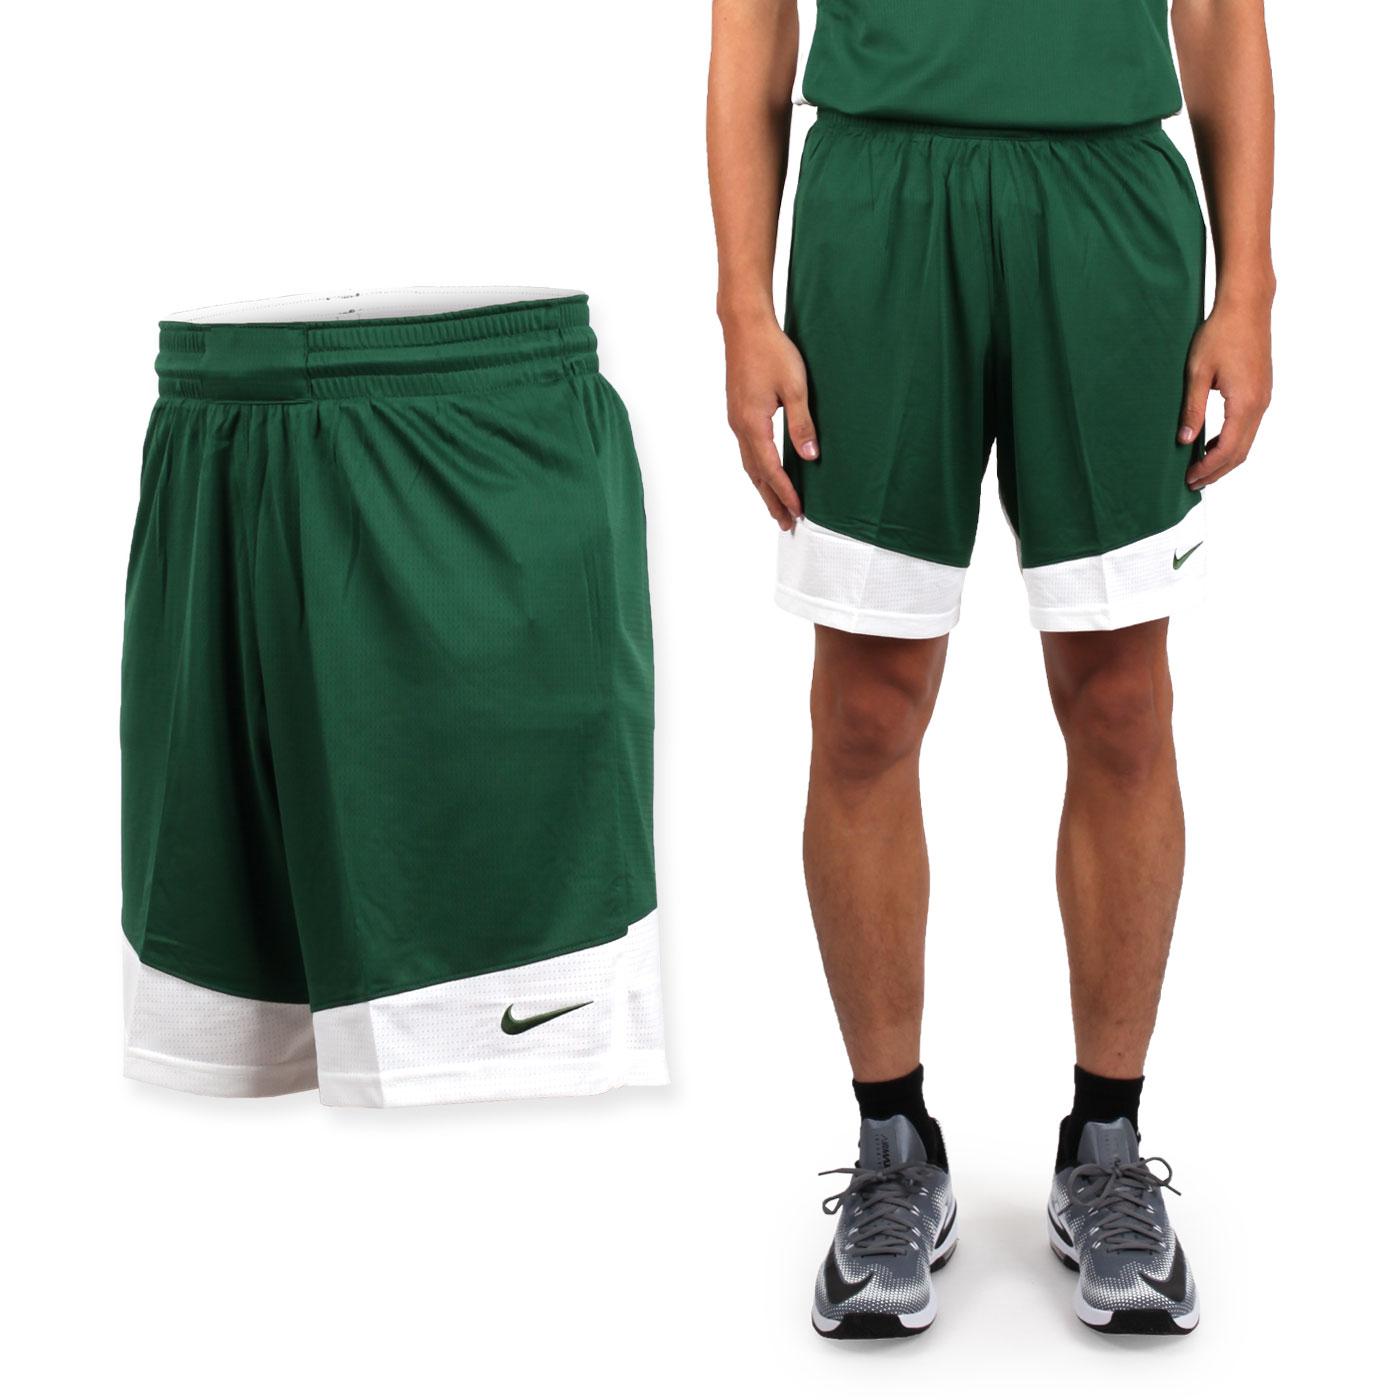 NIKE 男款籃球針織短褲 867769342 - 綠白